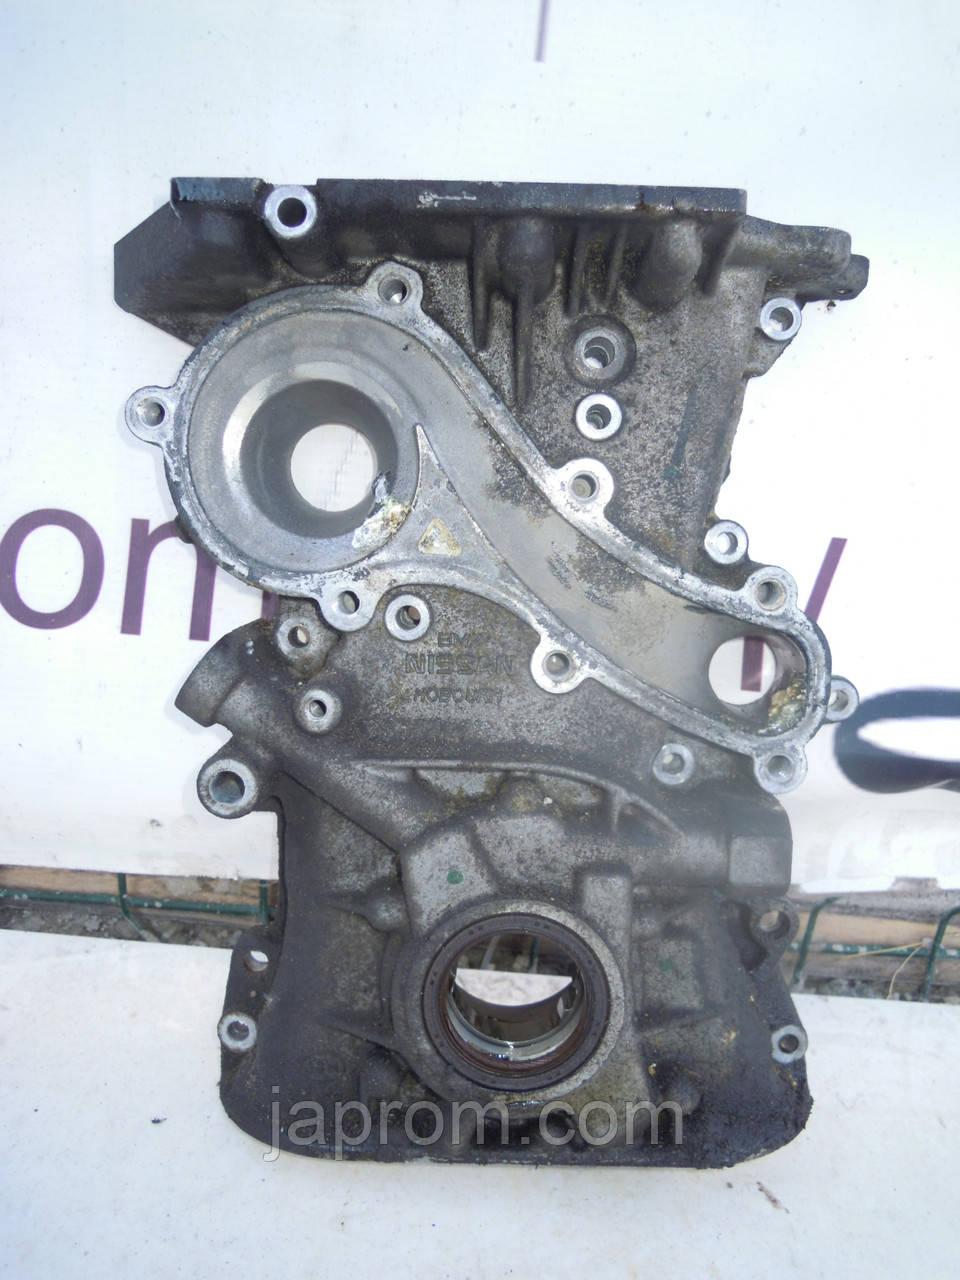 Масляный насос (Крышка) Nissan Almera Classic B10 N16  Primera P11 P12  1.5, 1.6, 1.8 бензин